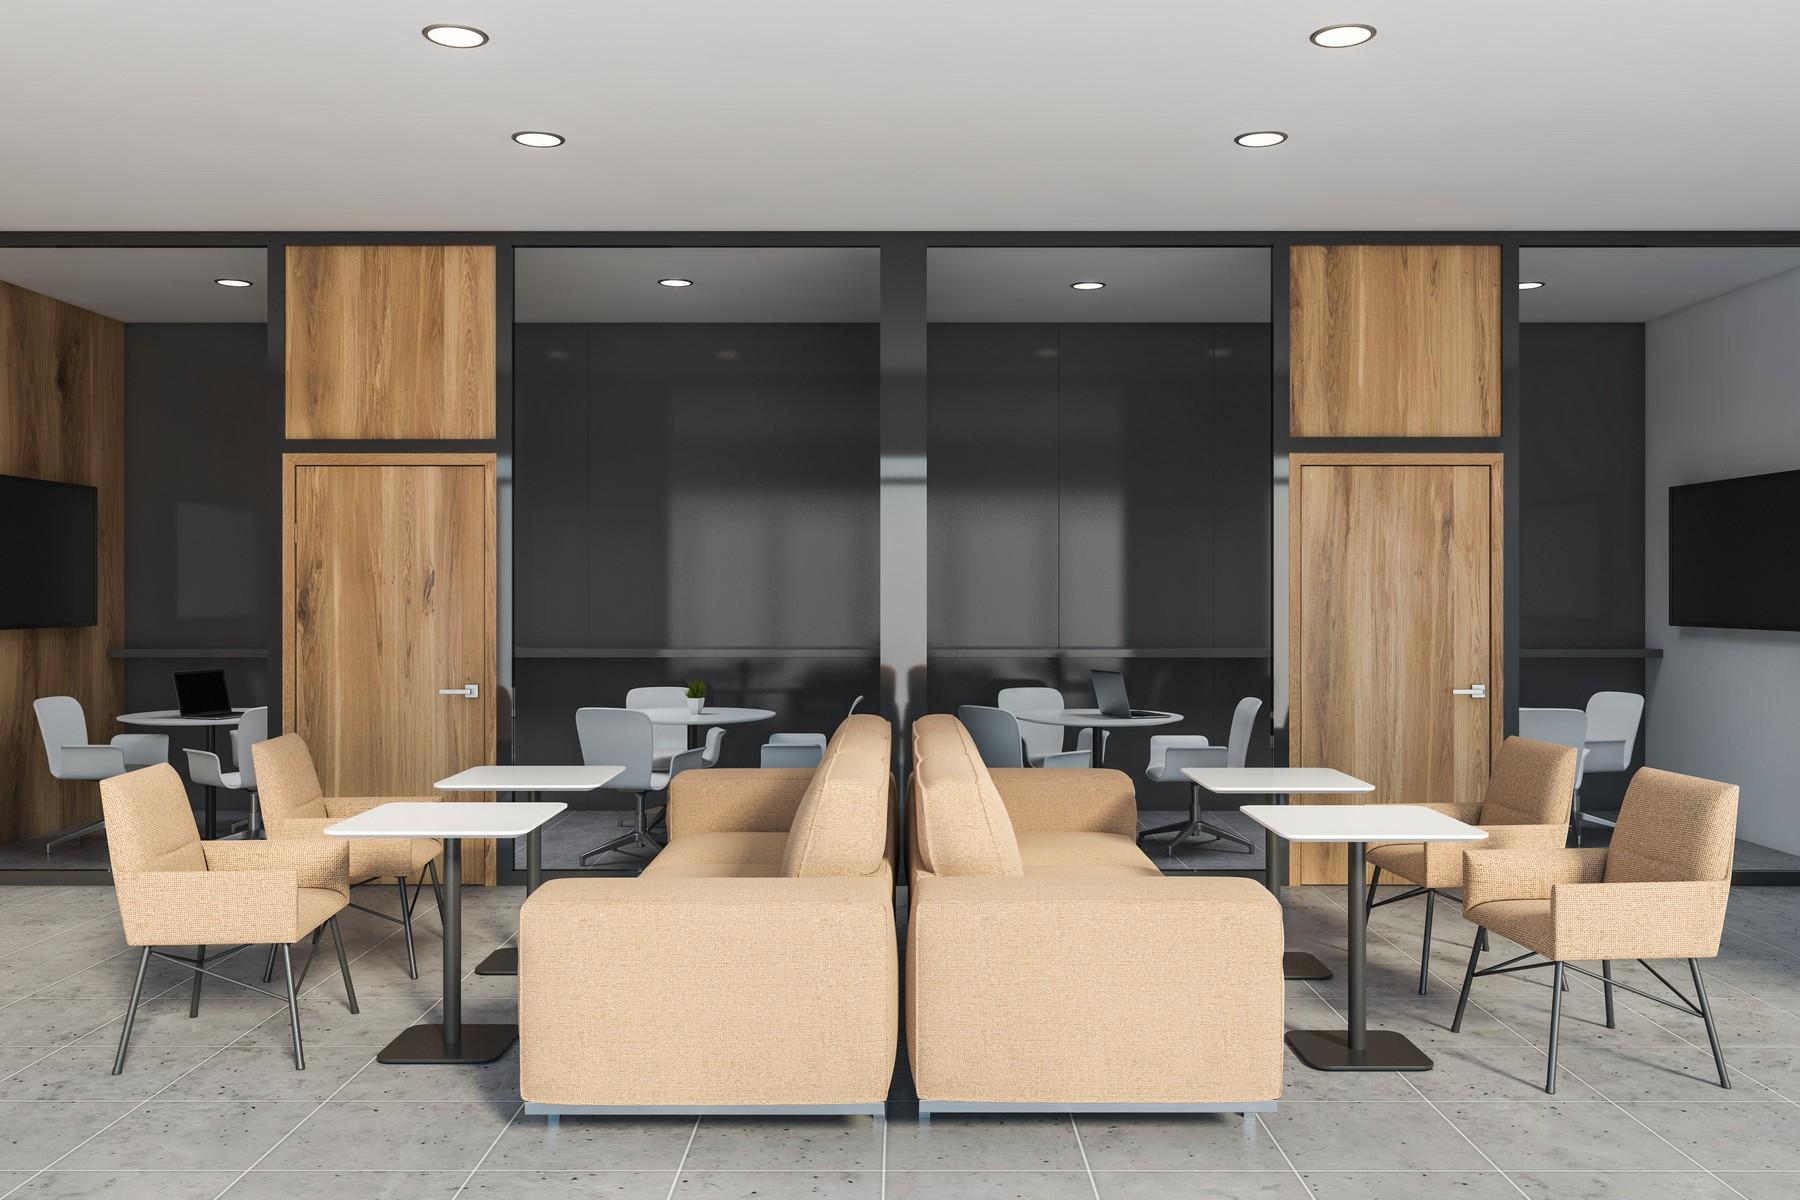 Omaha Break Rooms | Healthy | Micro-market | Workplace Culture